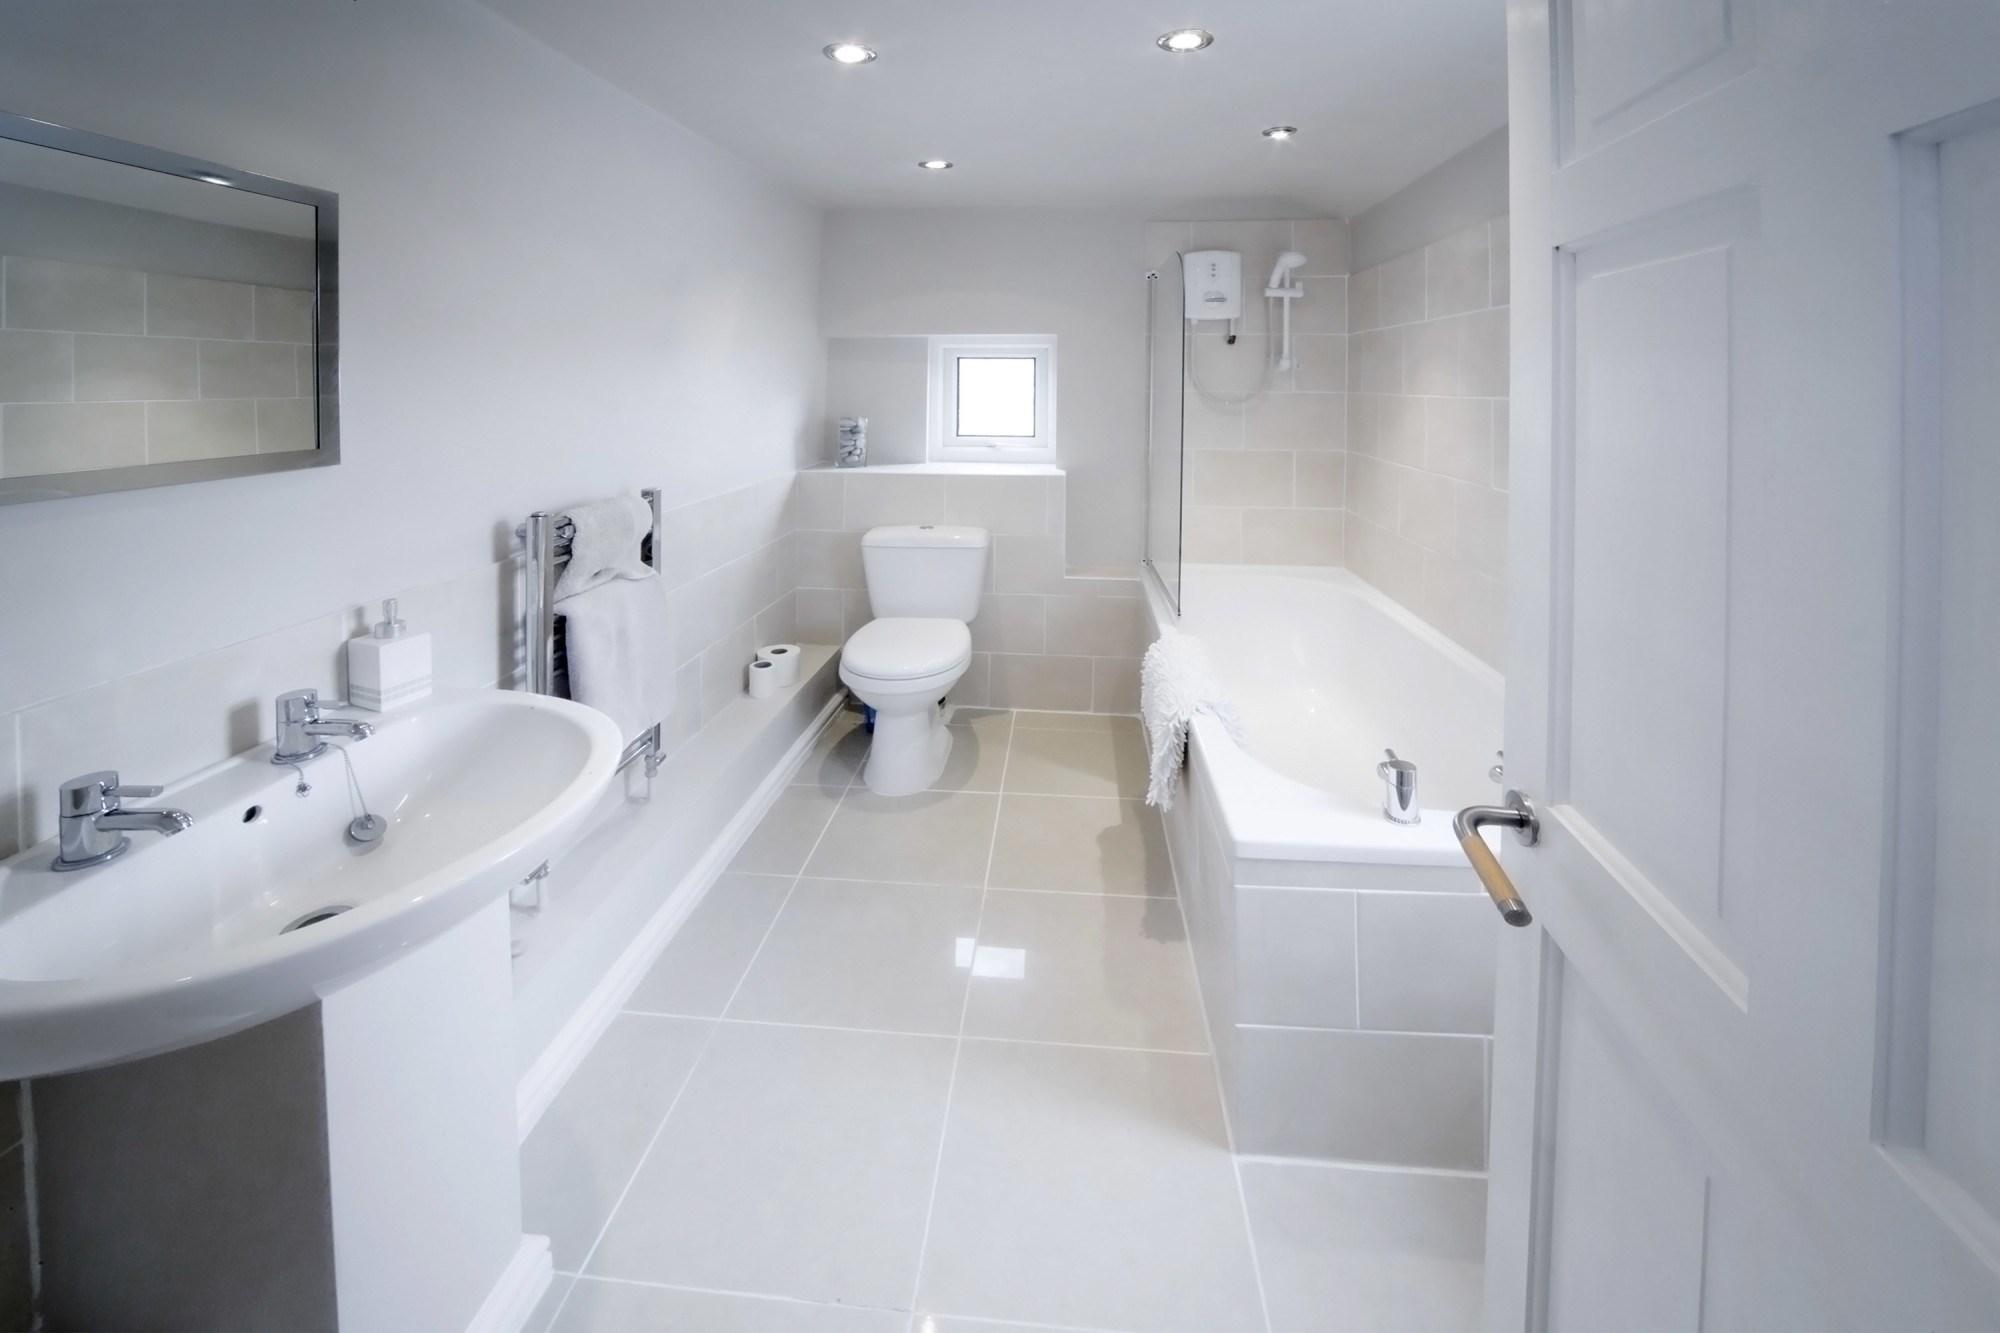 How to Waterproof a Bathroom!